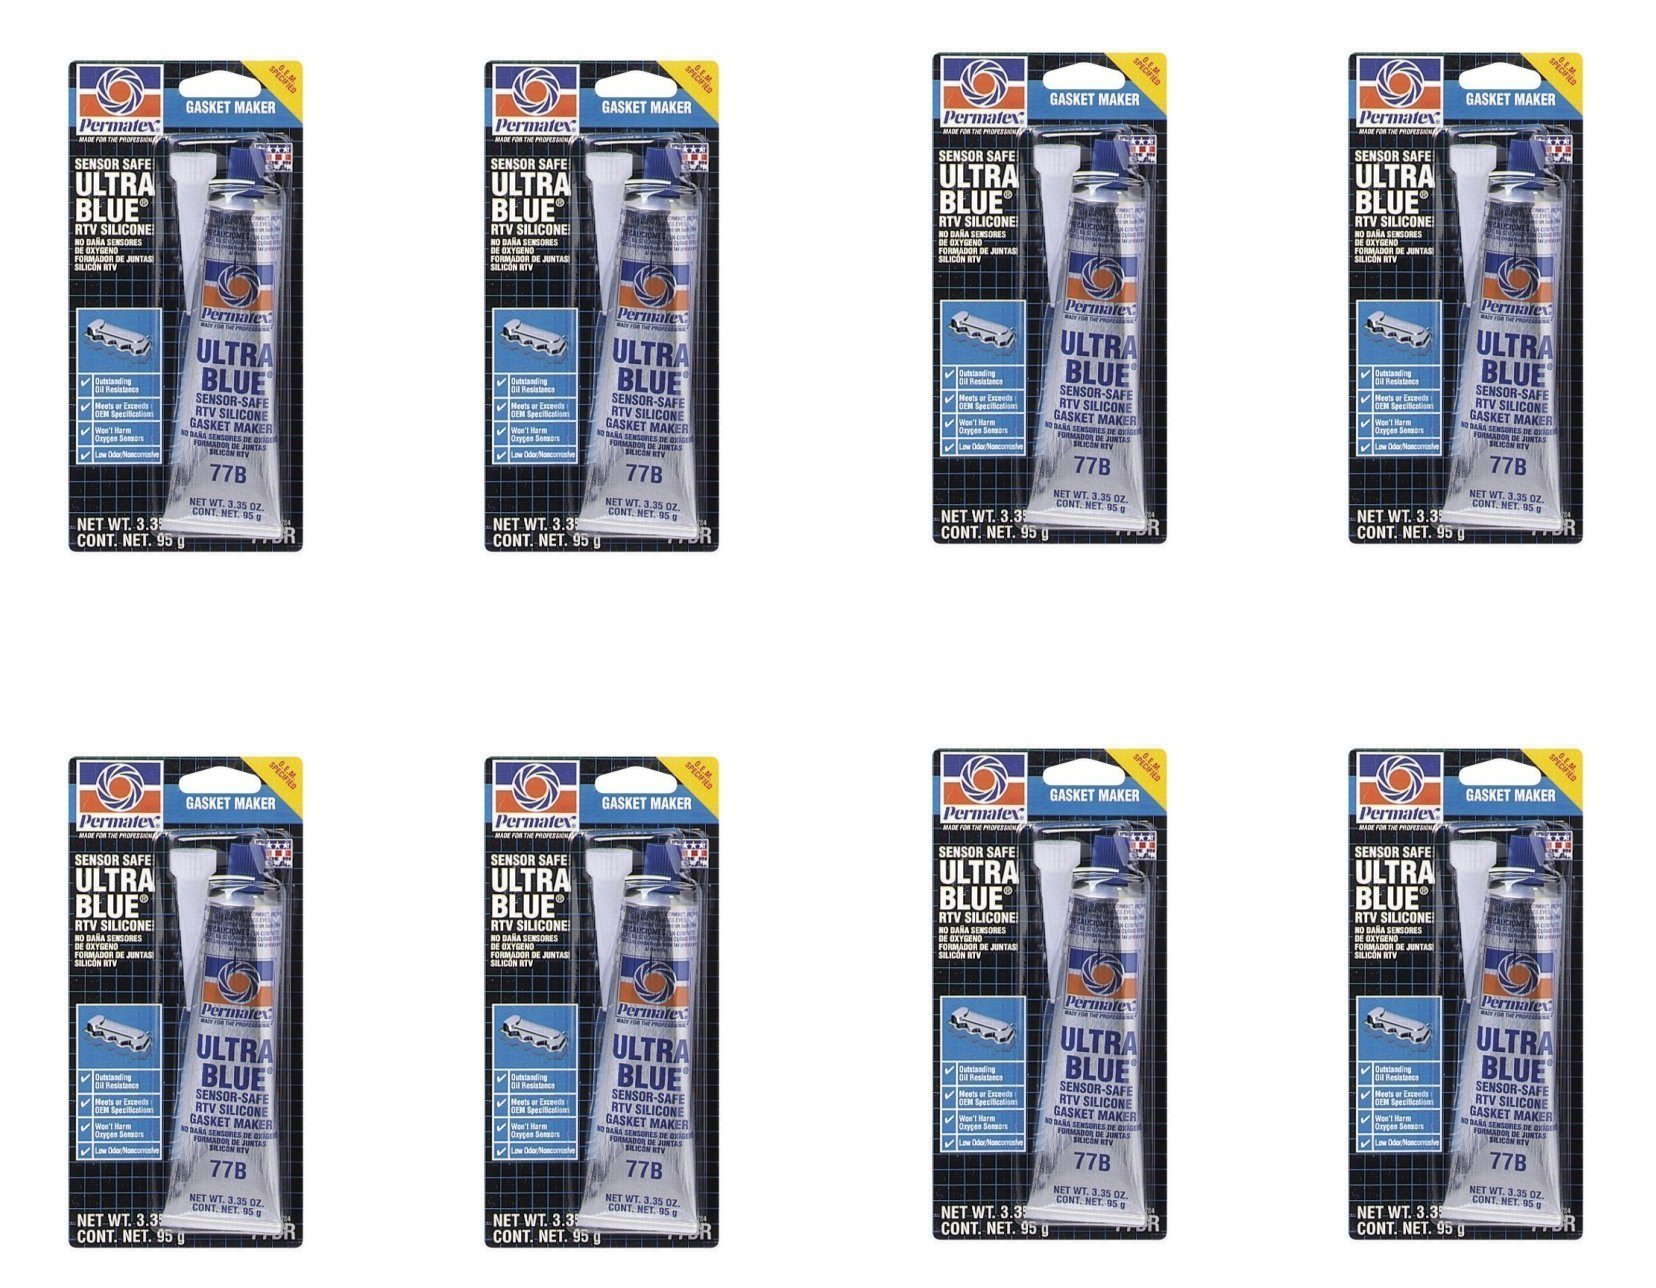 Permatex ® 81724 Ultra Blue Multipurpose RTV Silicone Gasket Maker - 3.35 oz Tube (77B) (8)